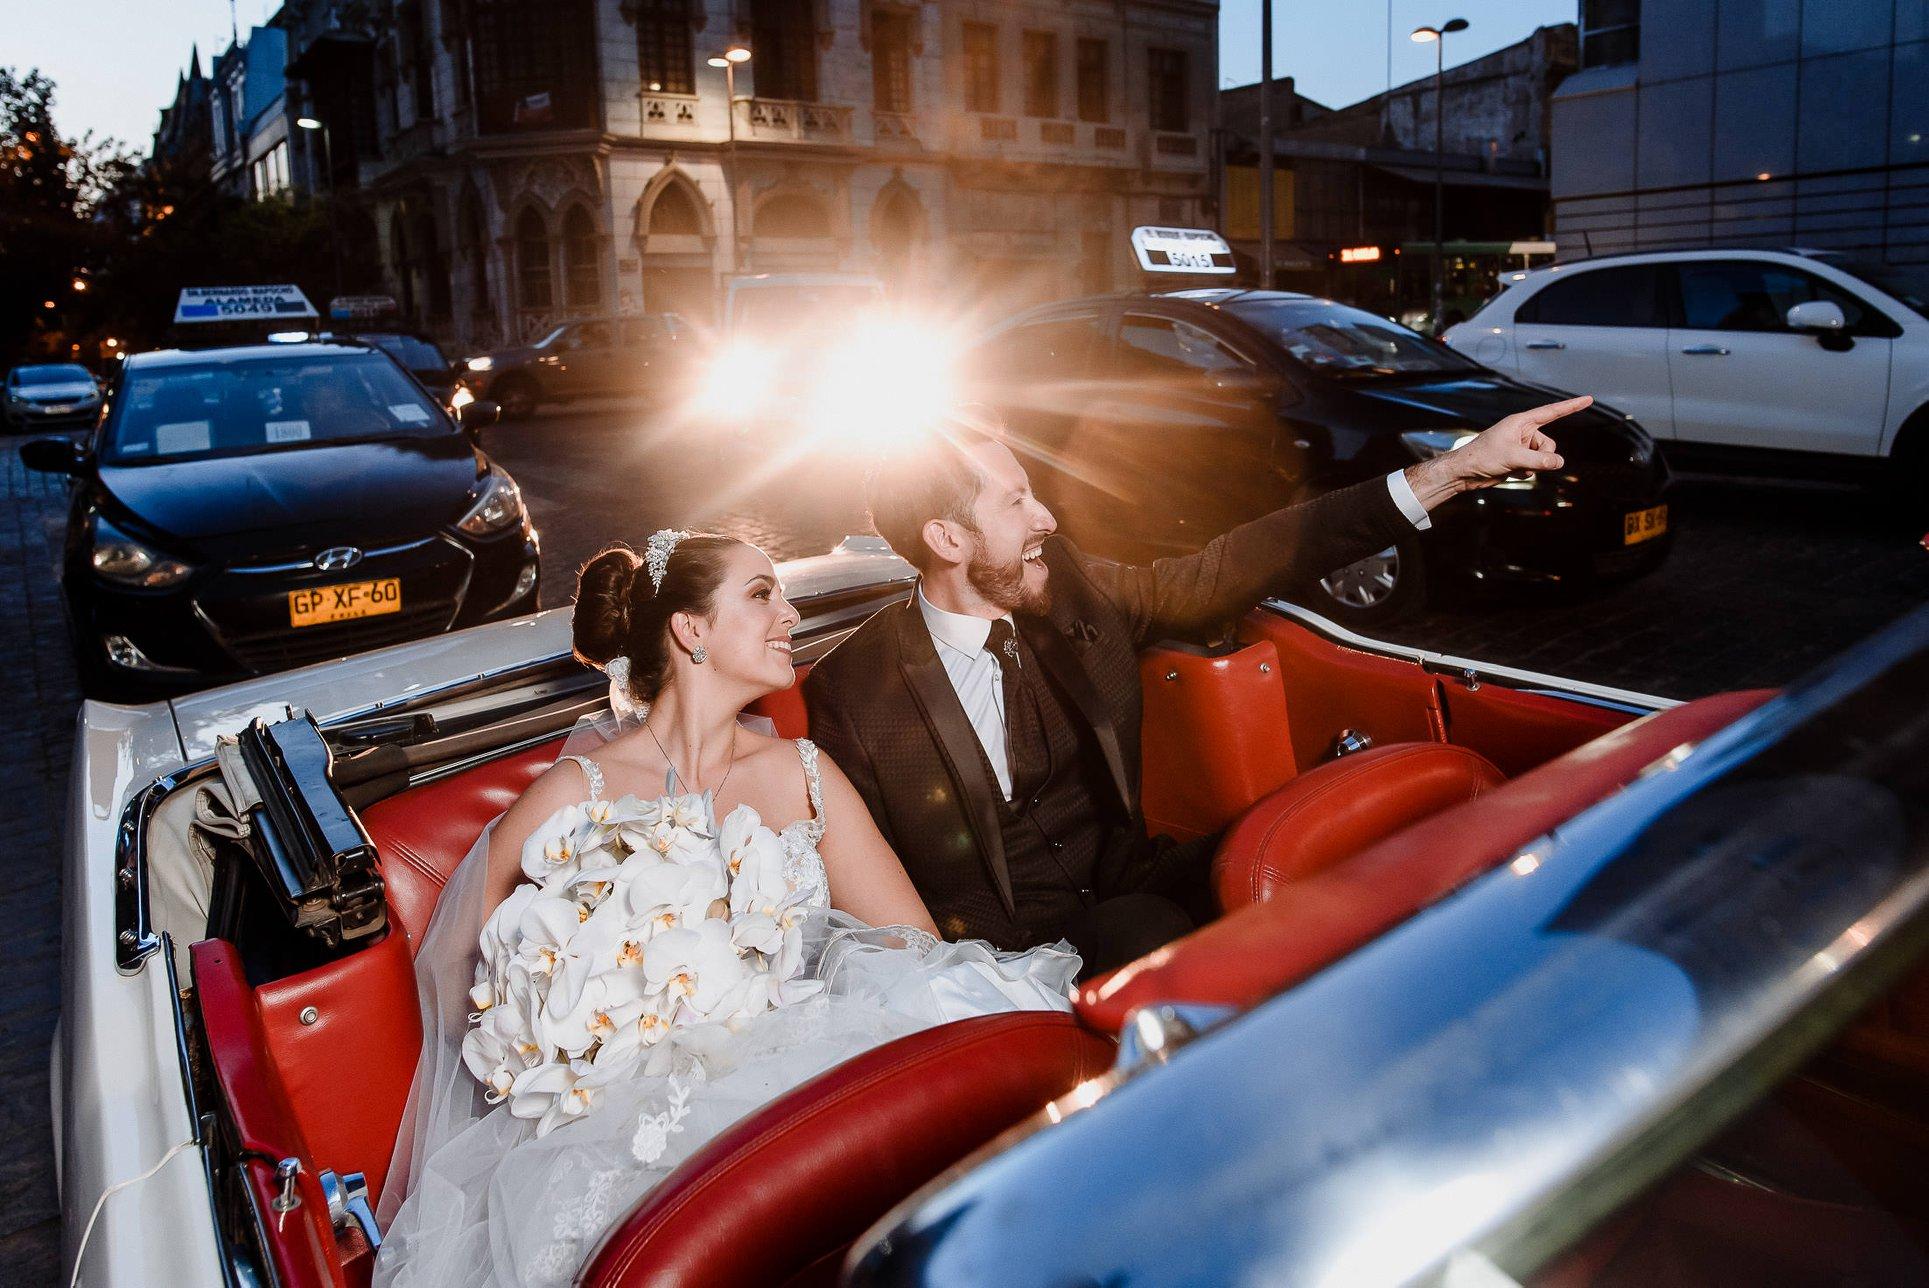 fotografia-de-bodas-españa-valencia-deborah-dantzoff-barcelona-fotografo-destination-wedding-photographer-matrimonio-chile-uruguay